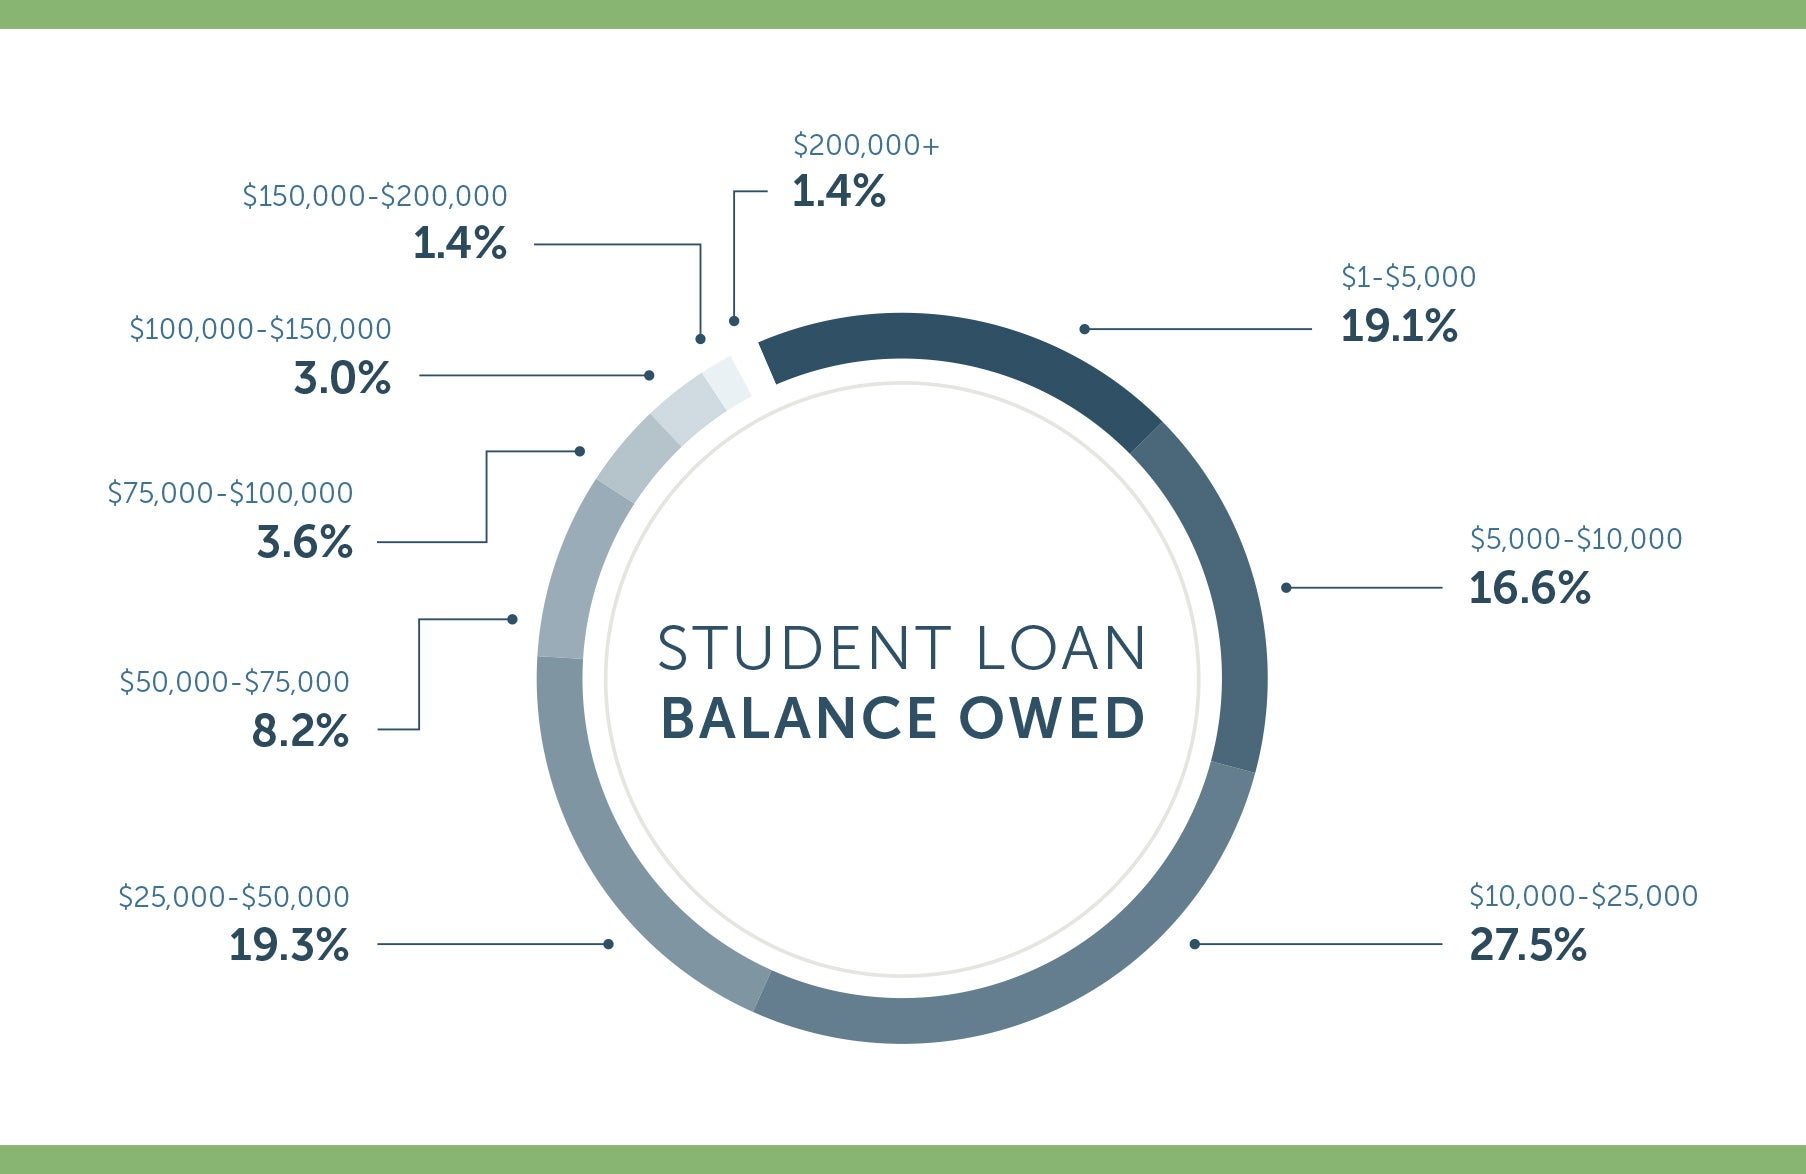 student loan debt statistics for 2018 - lexington law